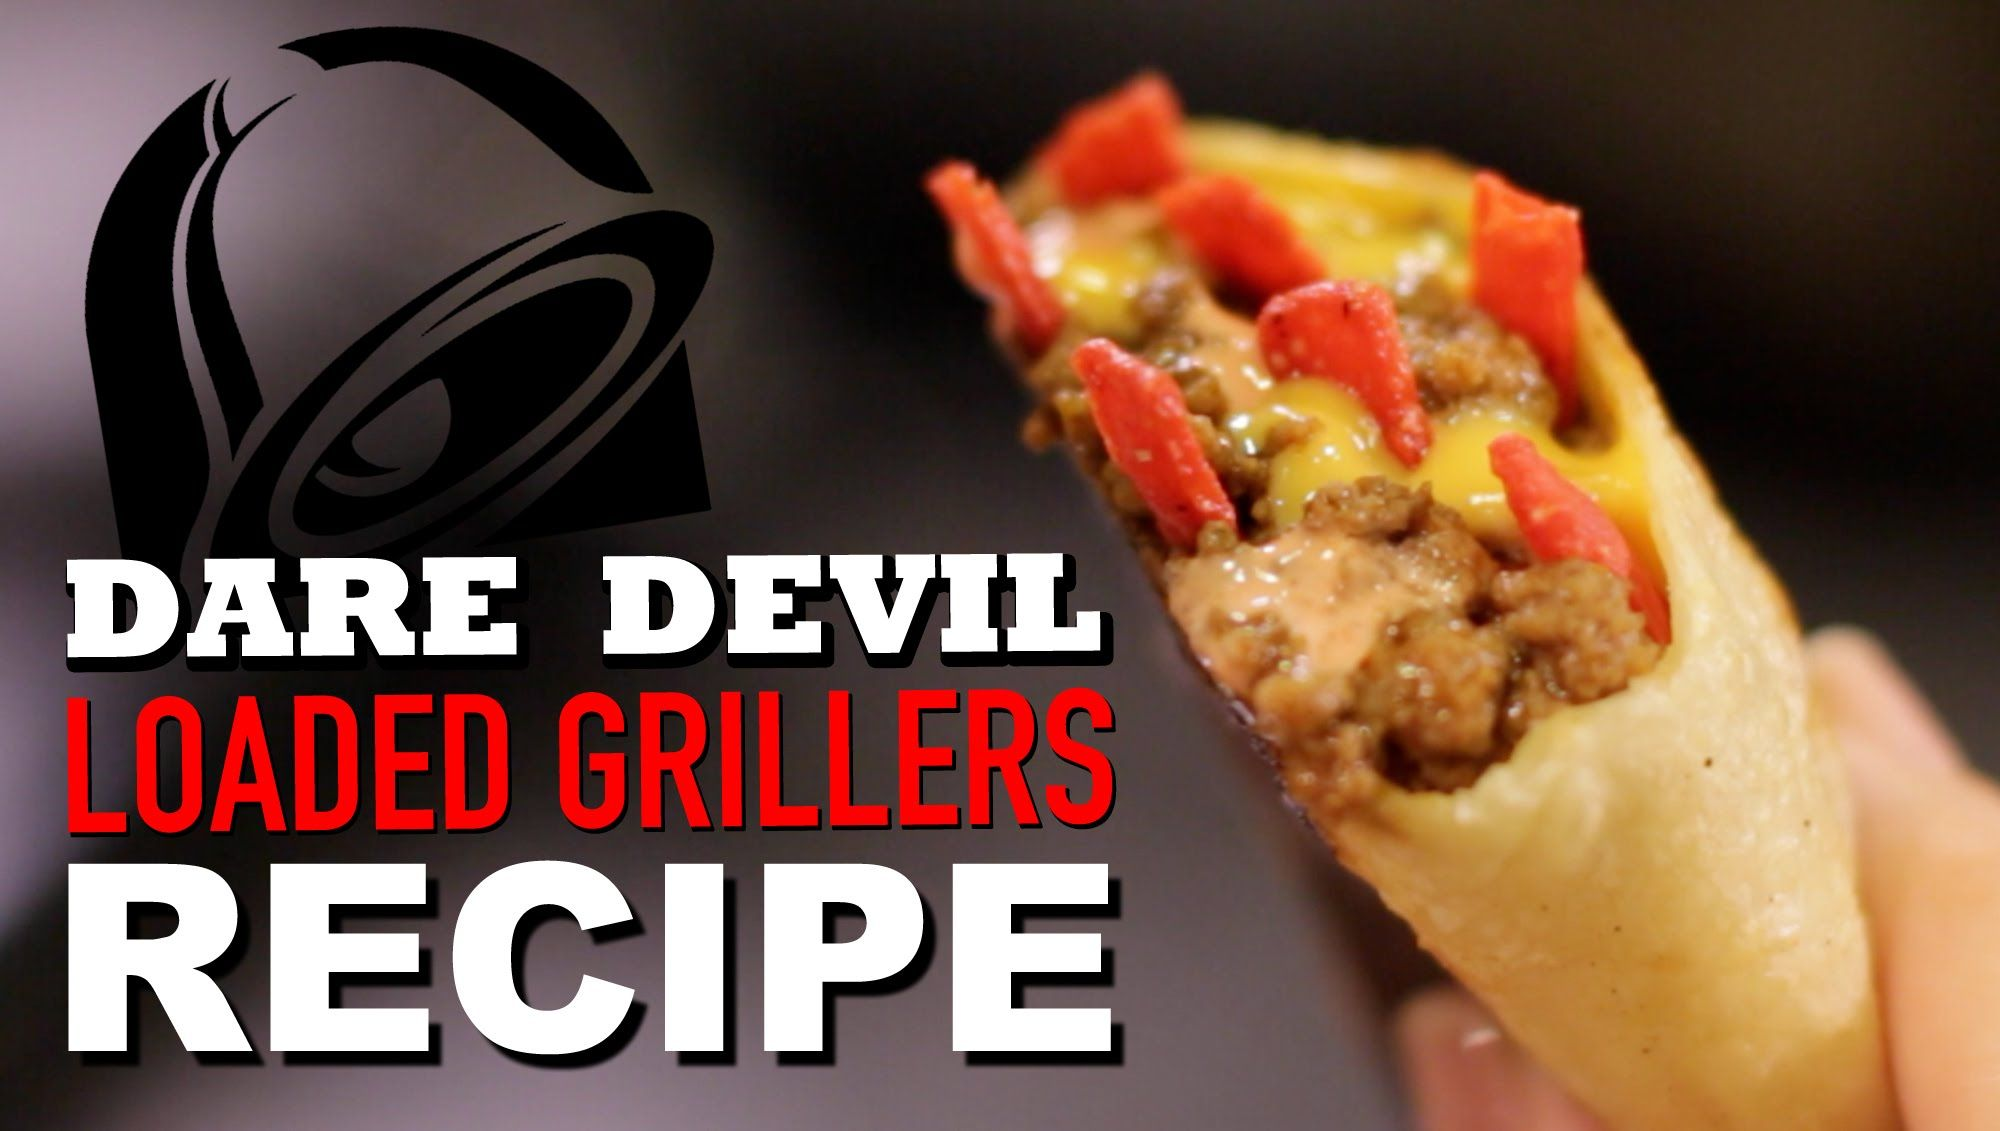 Taco bell dare devil loaded grillers recipe hellthyjunkfood my taco bell dare devil loaded grillers recipe hellthyjunkfood forumfinder Image collections